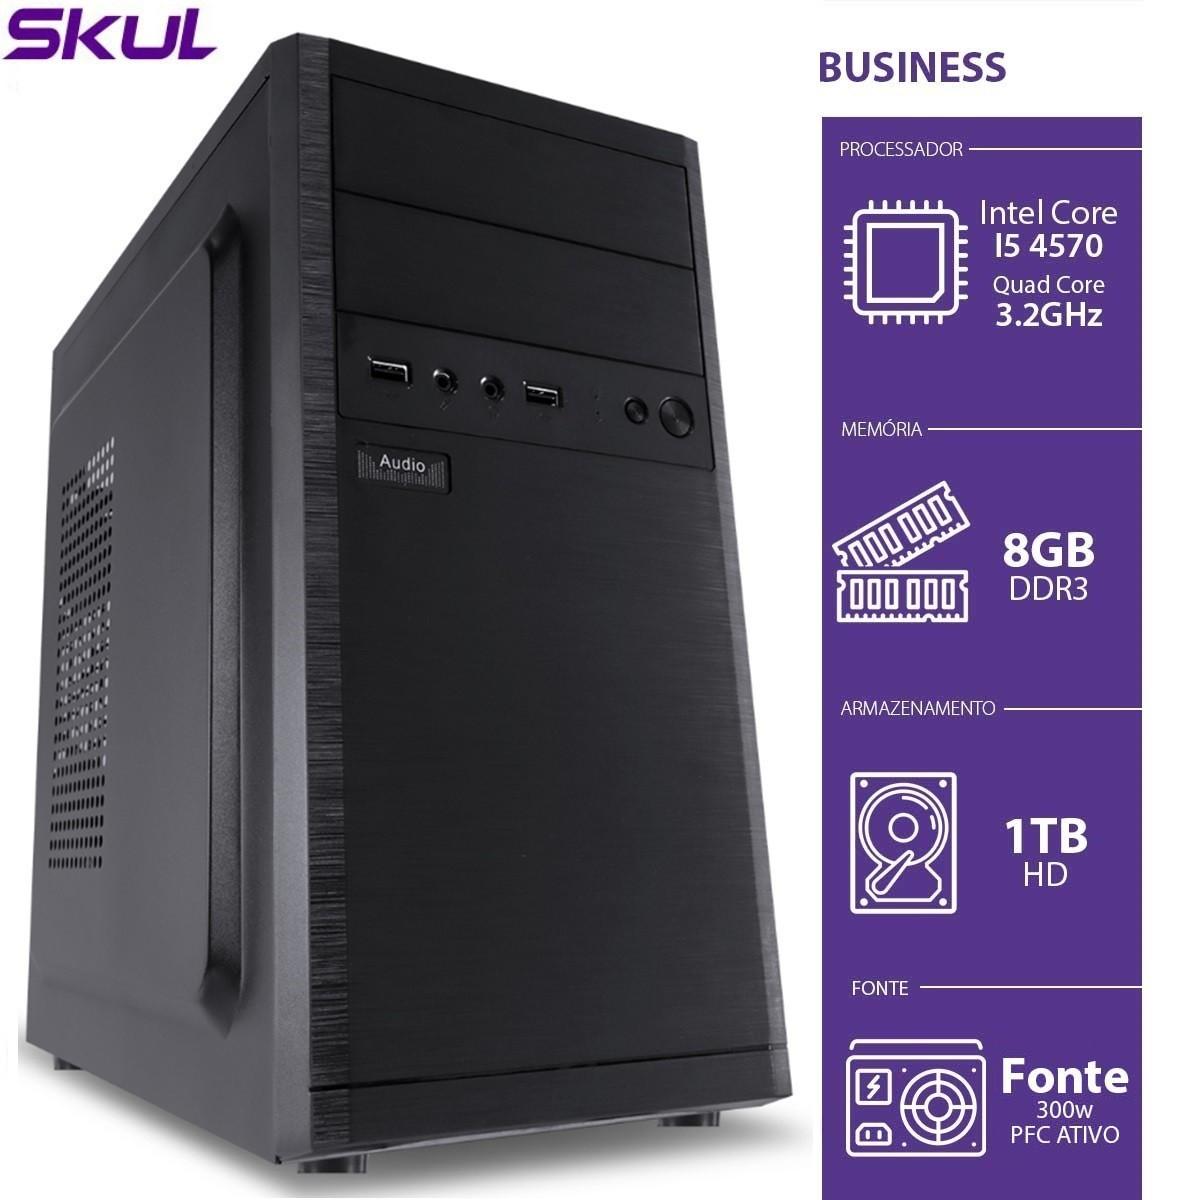 Computador Business B500 - I5-4570 3.2GHZ 8GB DDR3 HD 1TB HDMI/VGA Fonte 300W PFC Ativo - B45701T8